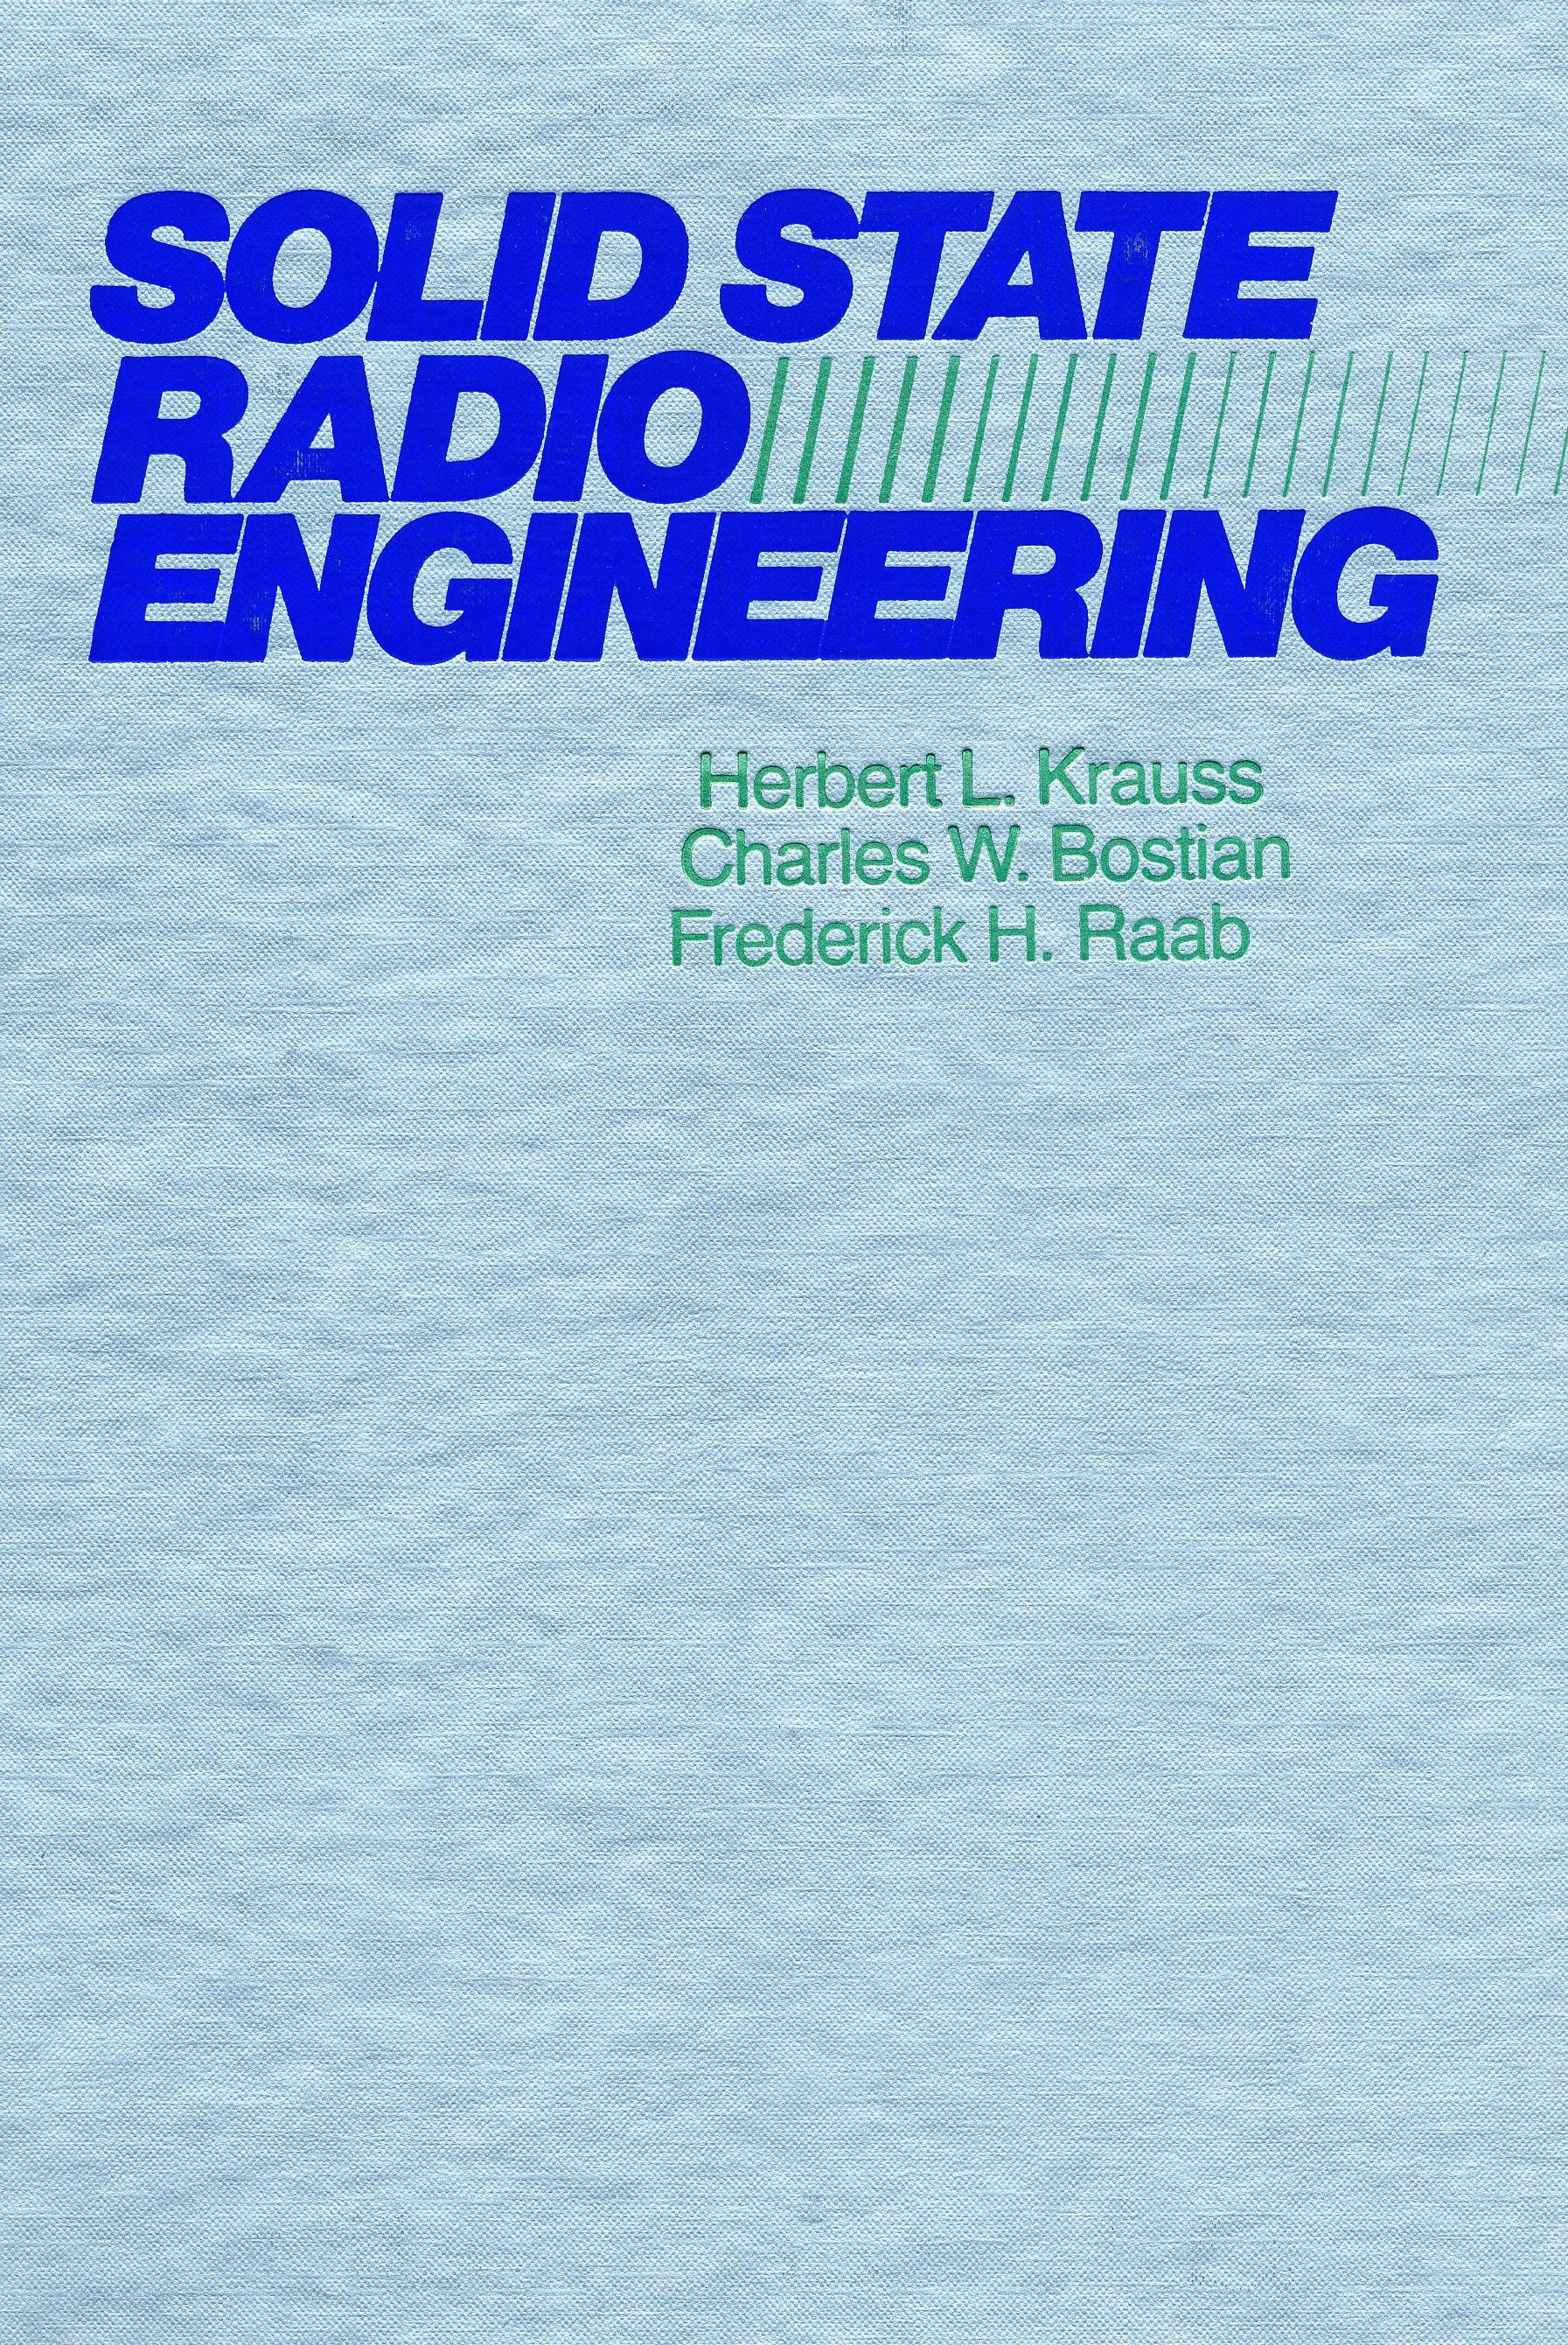 Solid State Radio Engineer